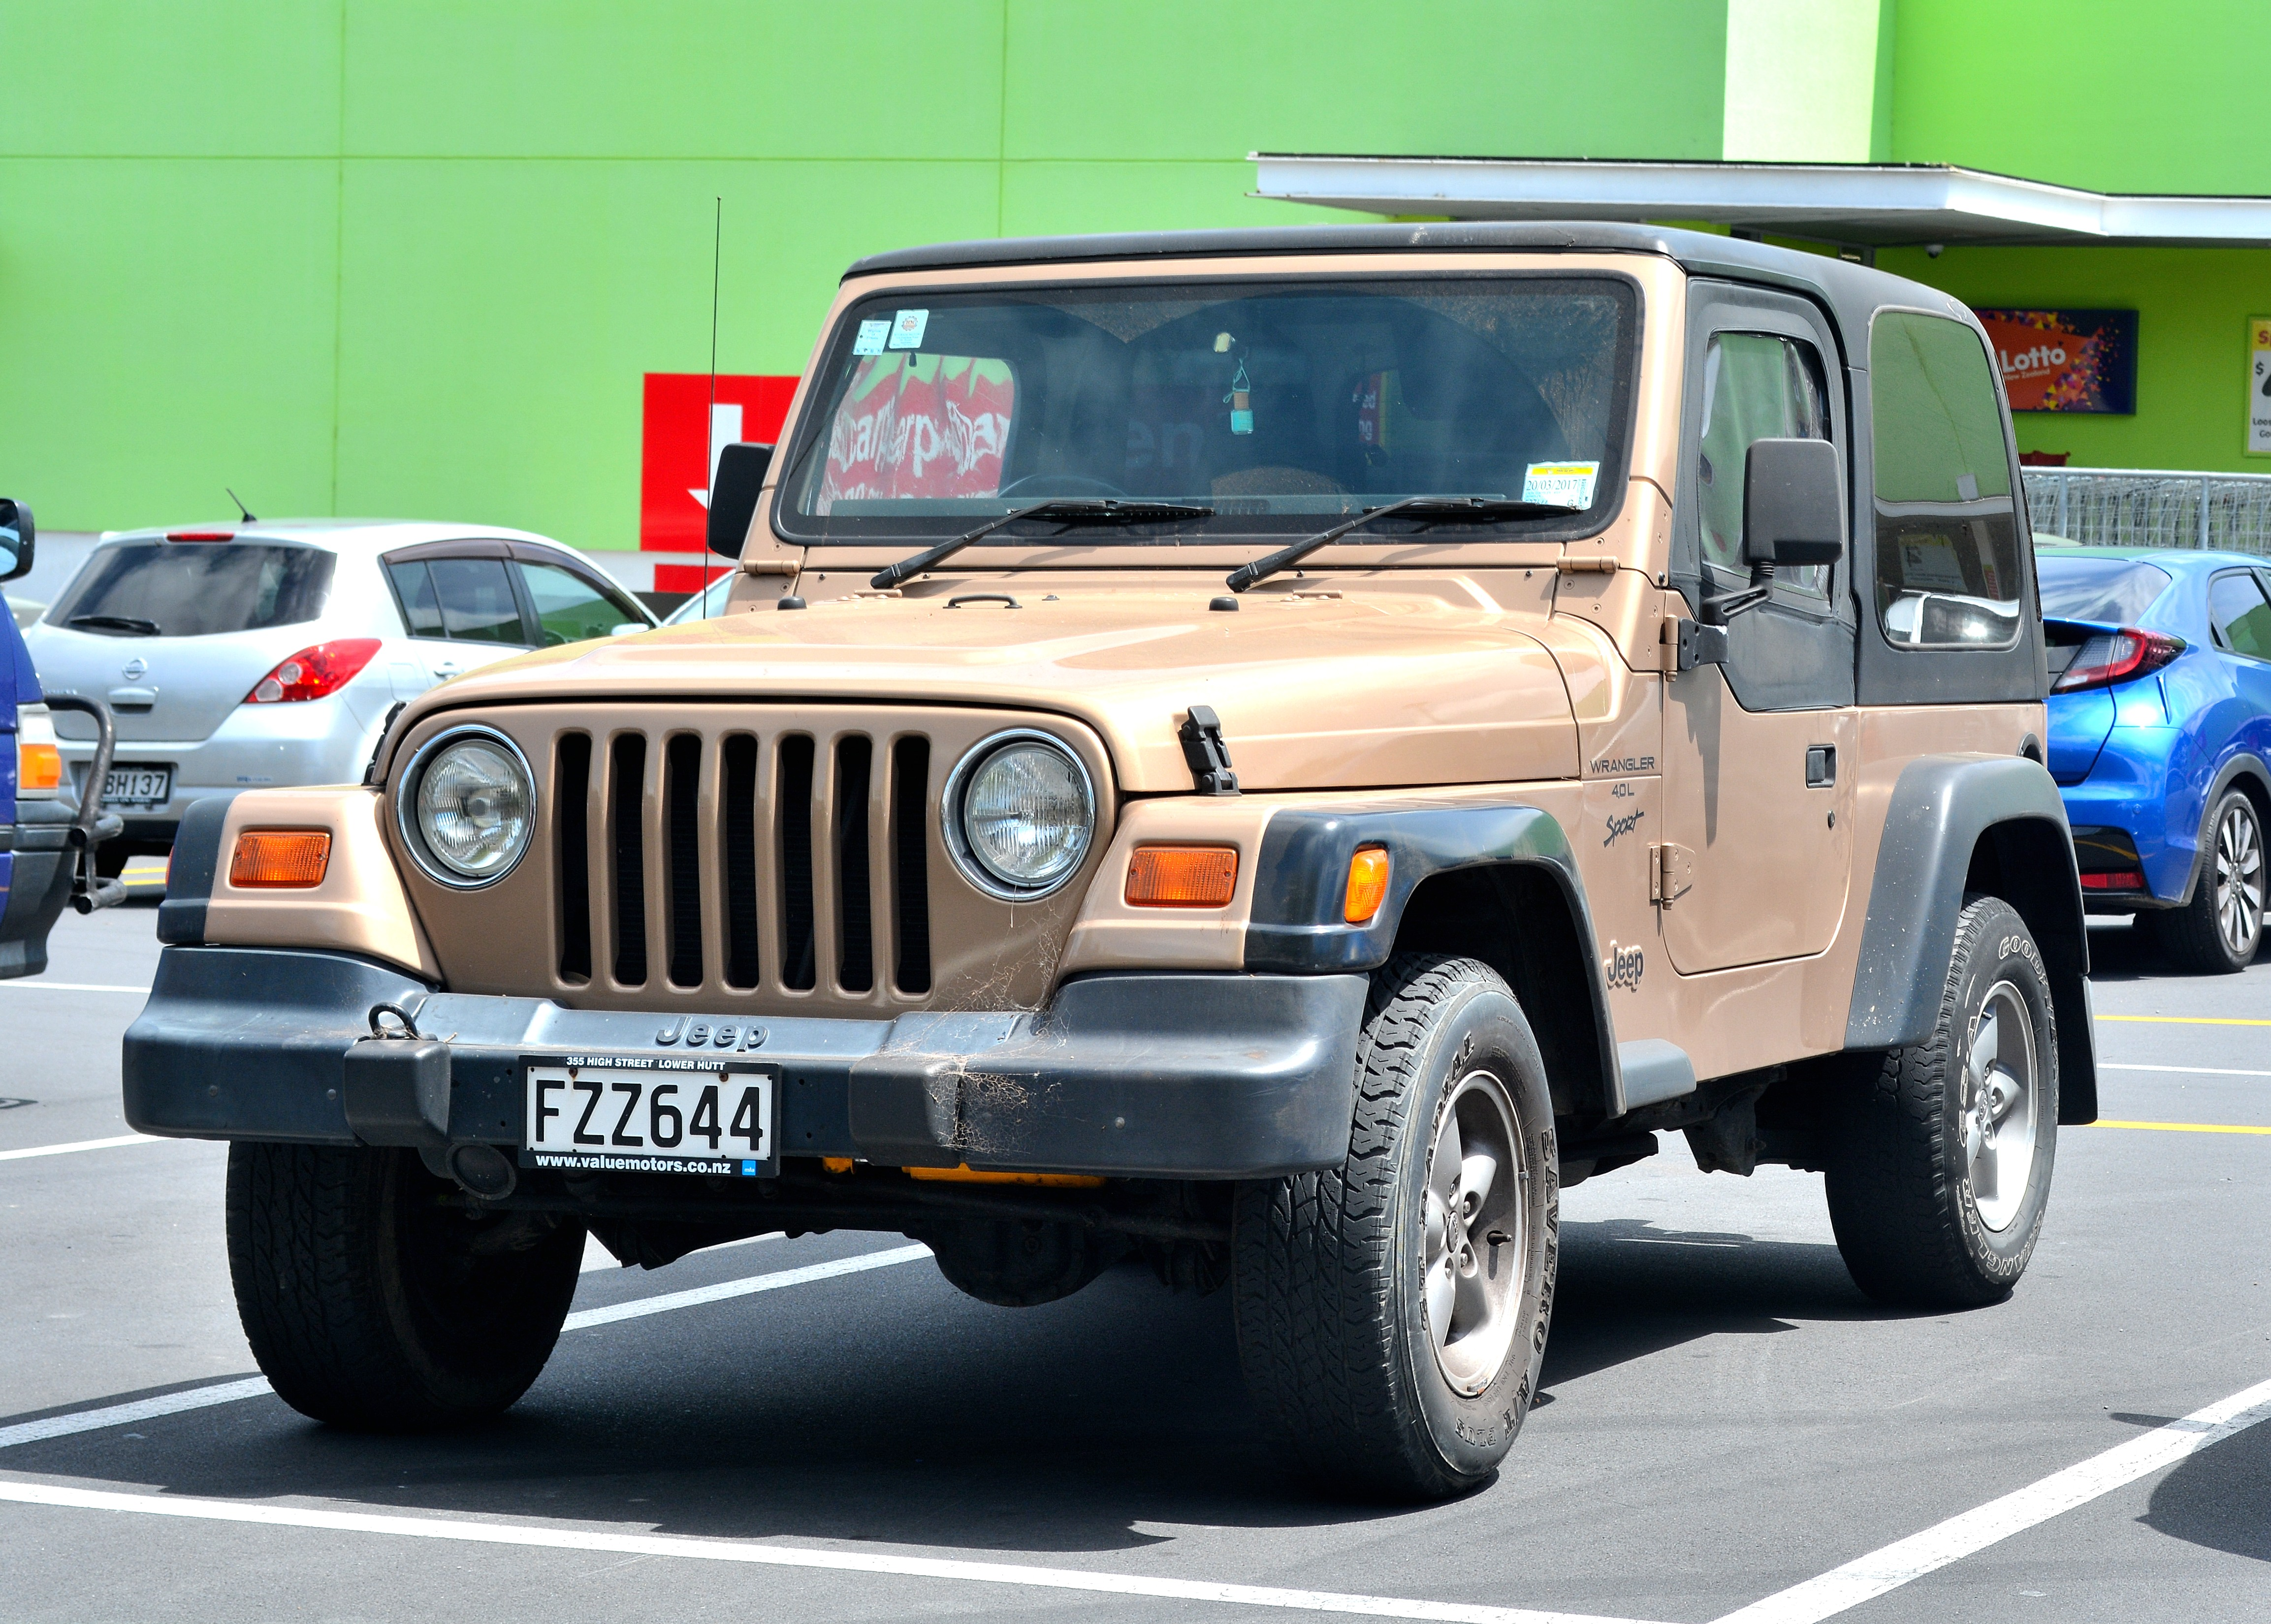 Charming File:1999 Jeep Wrangler Sport (32630359046)